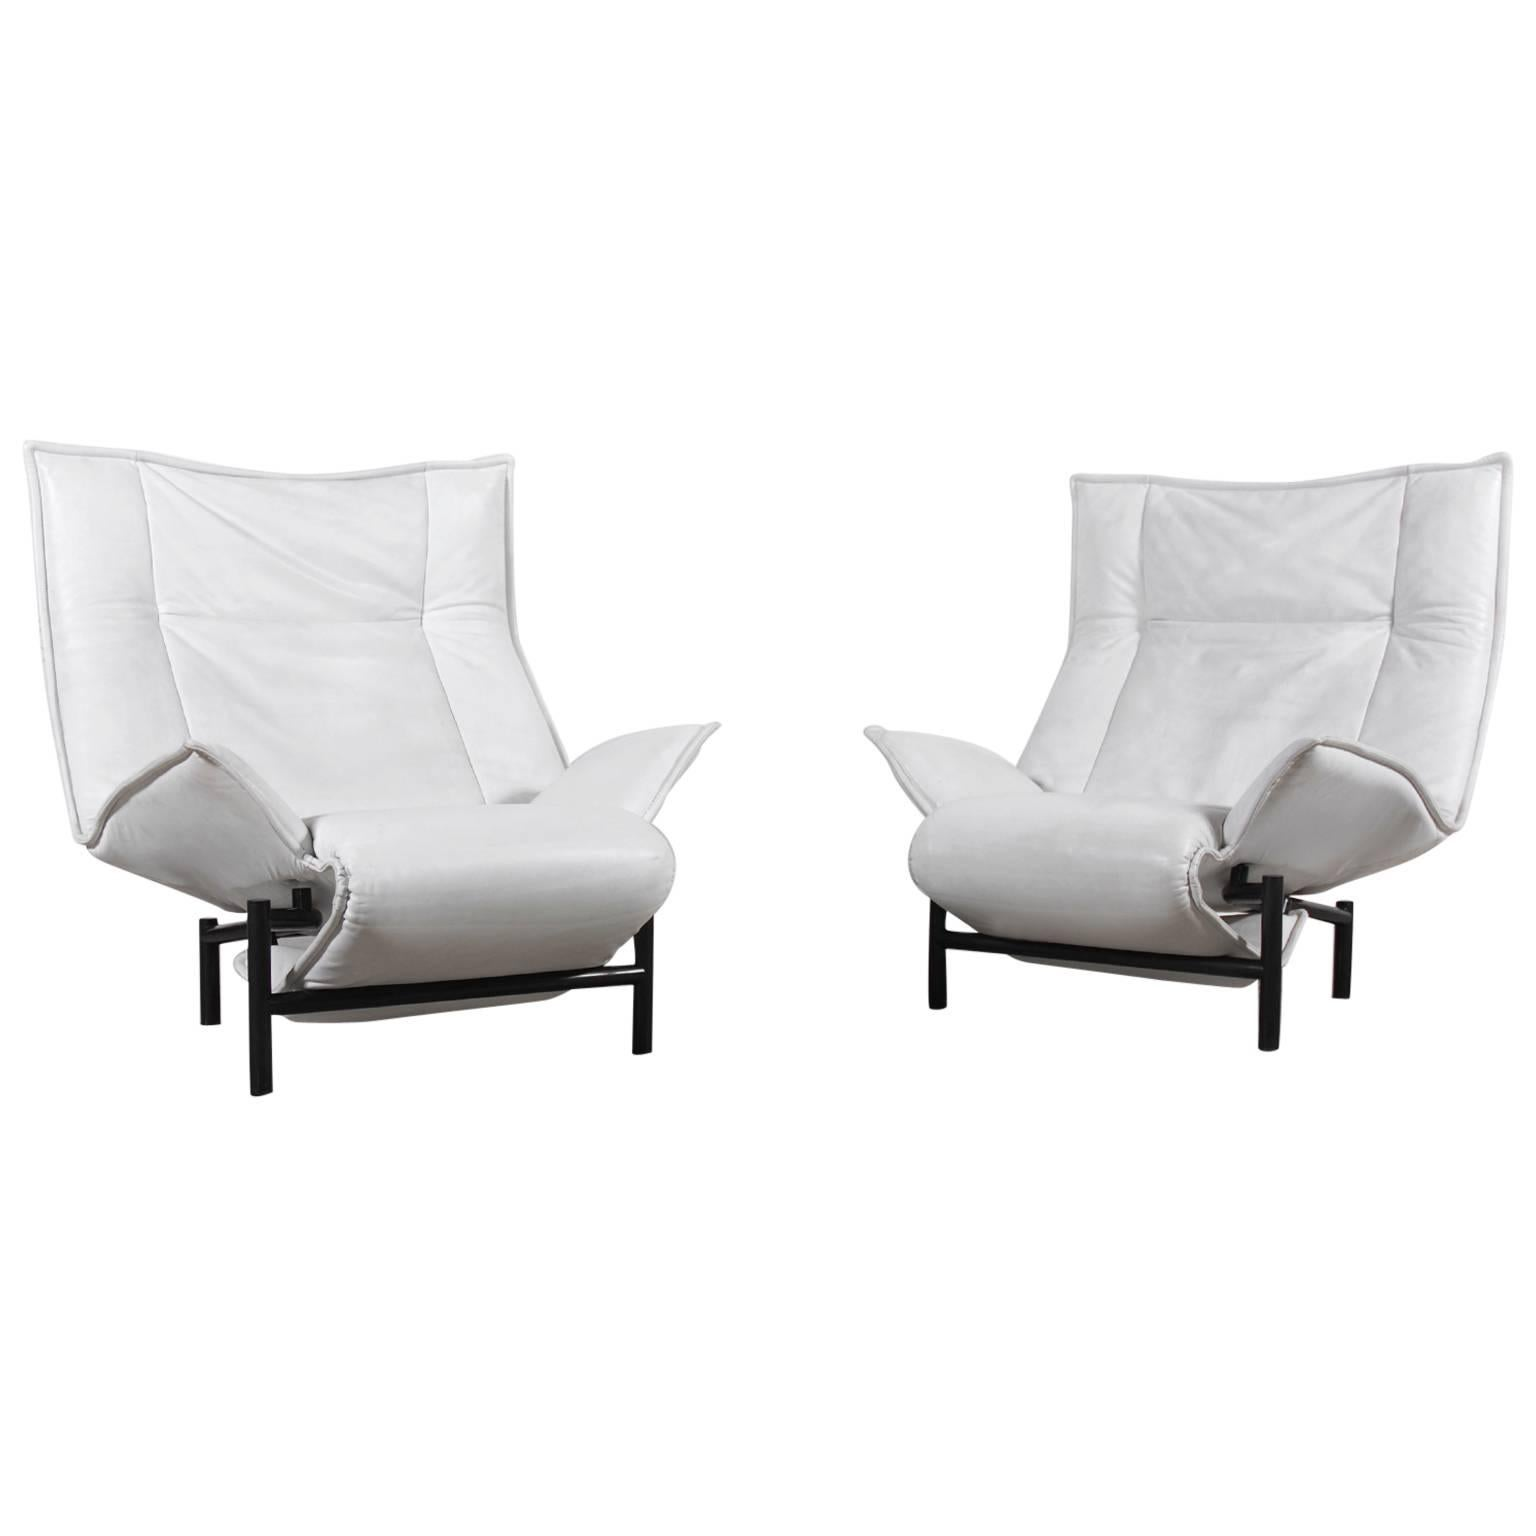 "Vico Magistretti Pair of ""Veranda"" Lounge Chairs for Cassina, 1983"